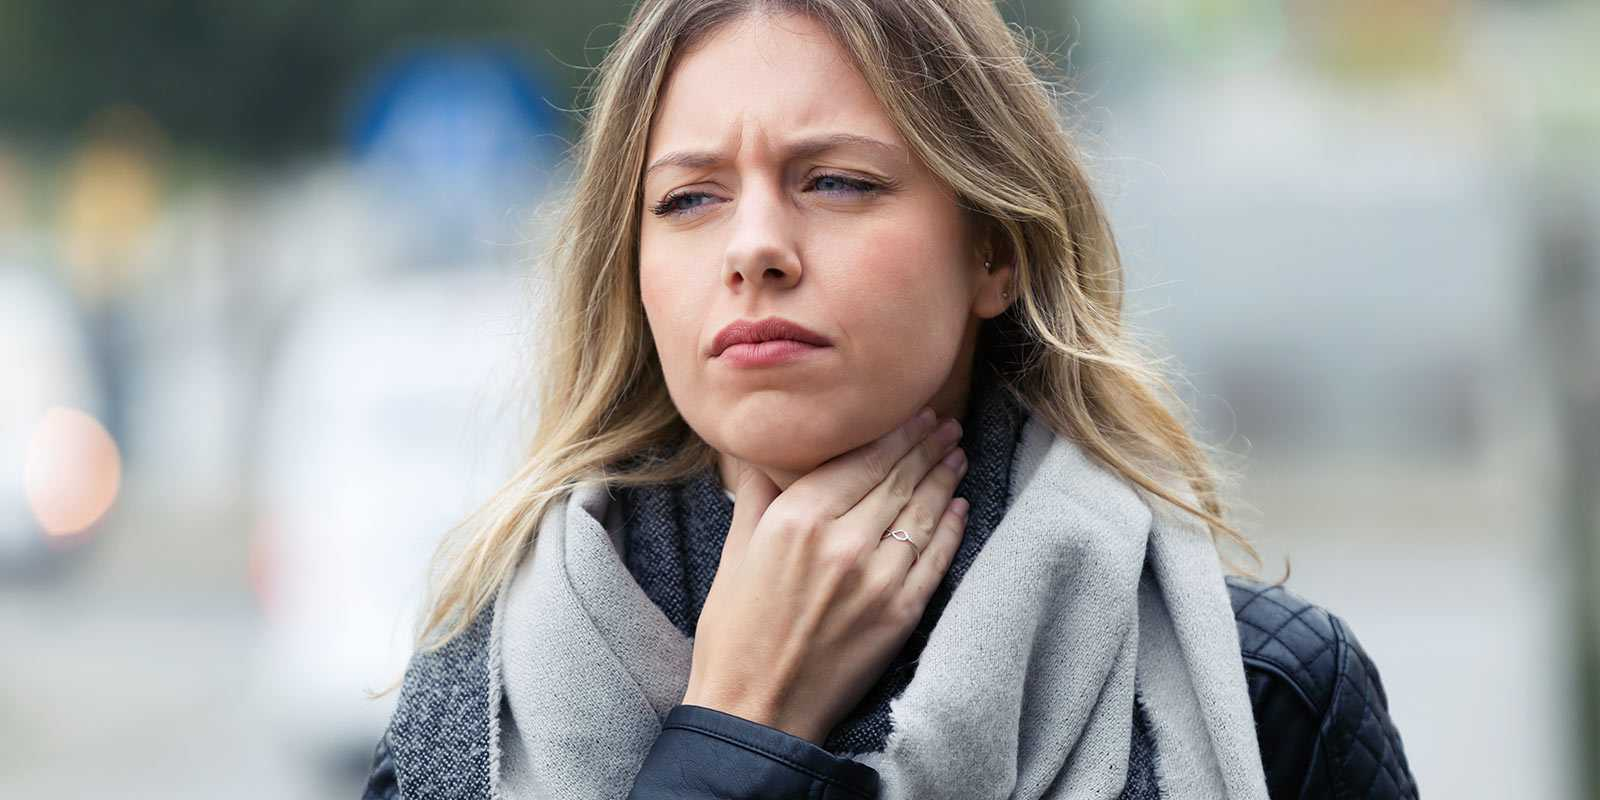 disfagia orofaringea